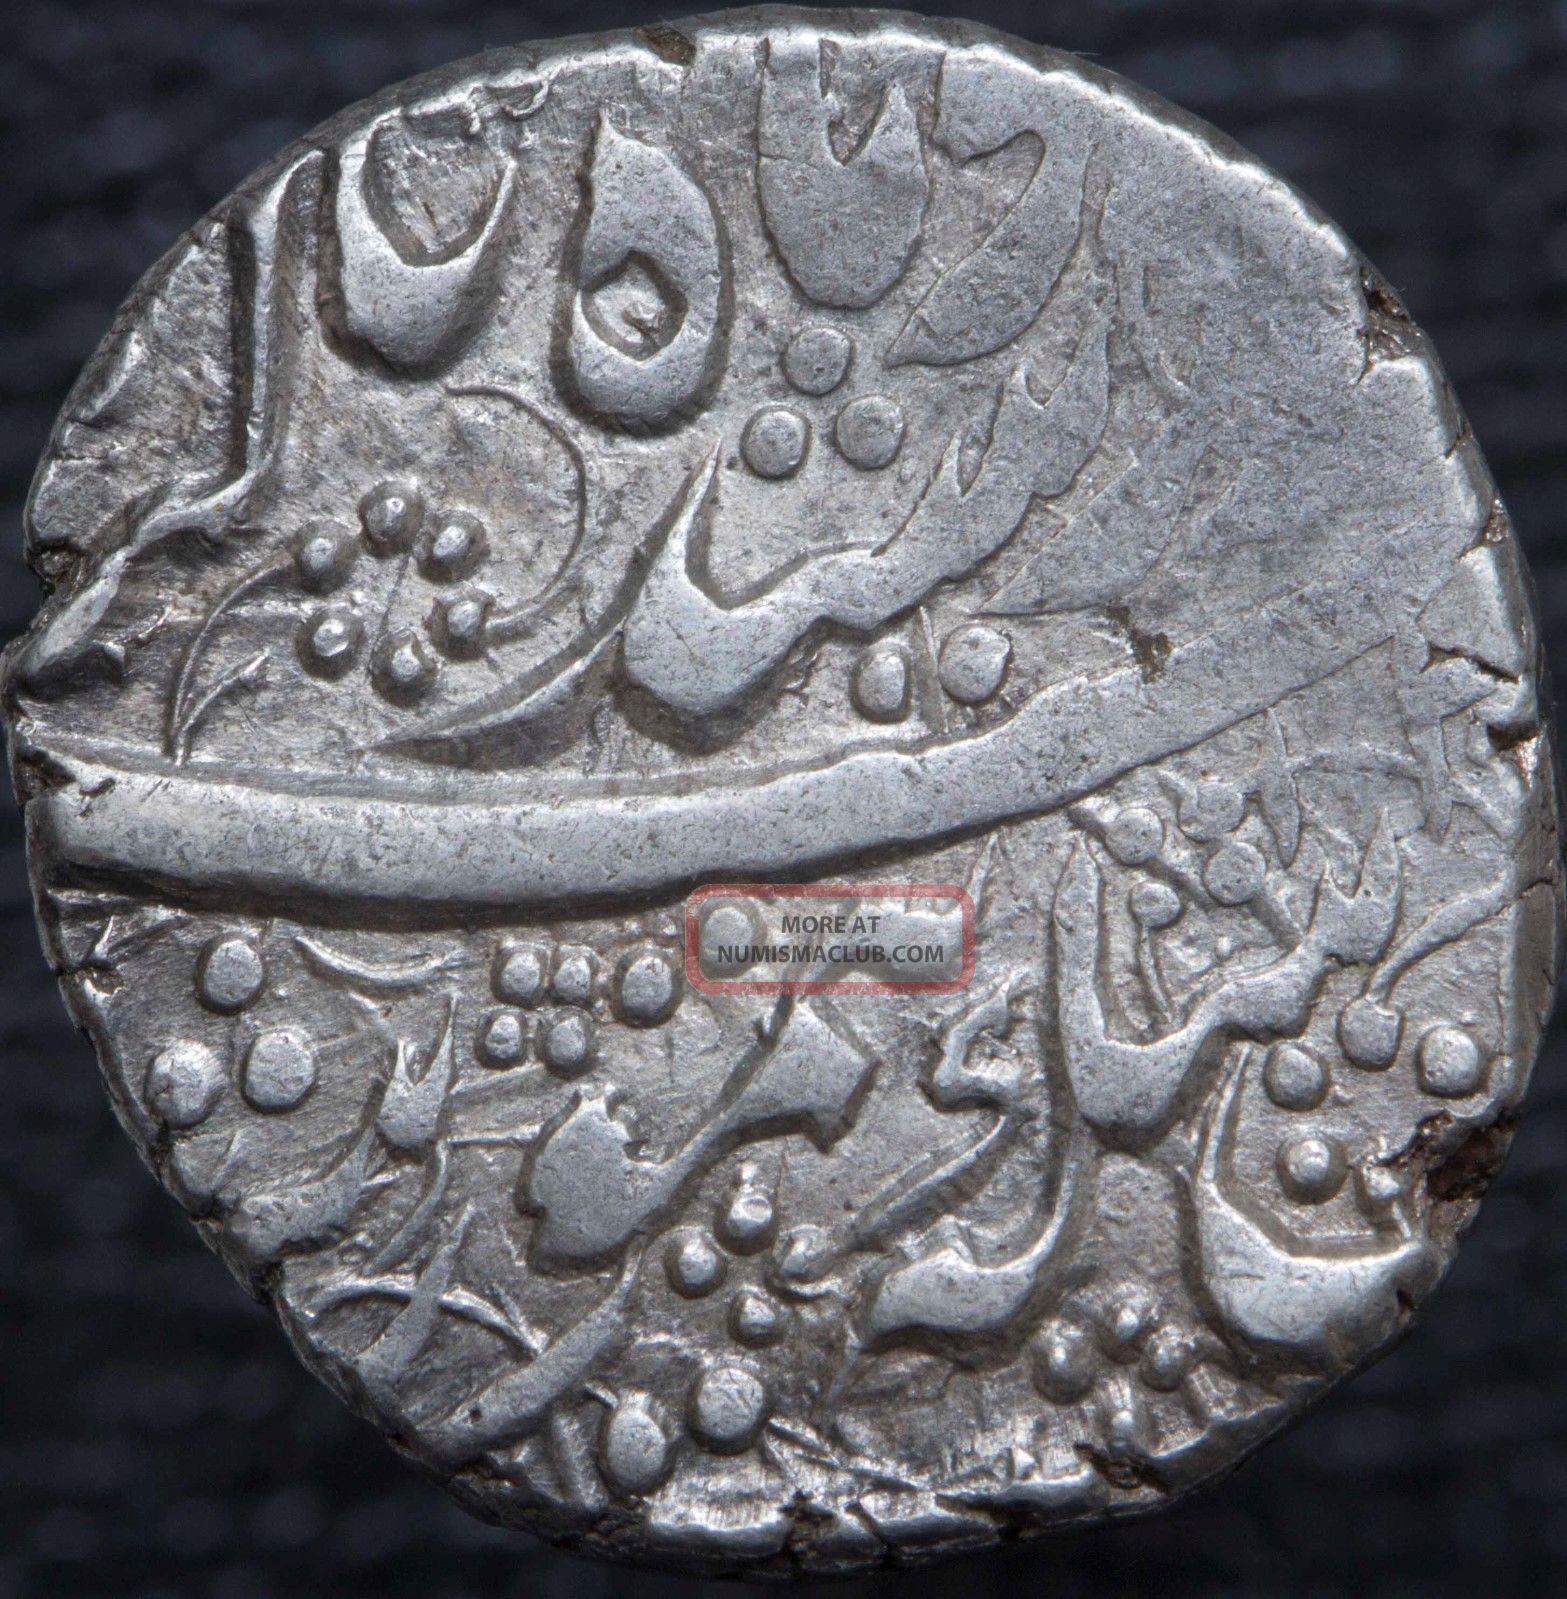 Afghanistan Durrani Taimur Shah 1772 - 1793 Ar Rupee Kabul Ry20 Km 433.  4 Middle East photo